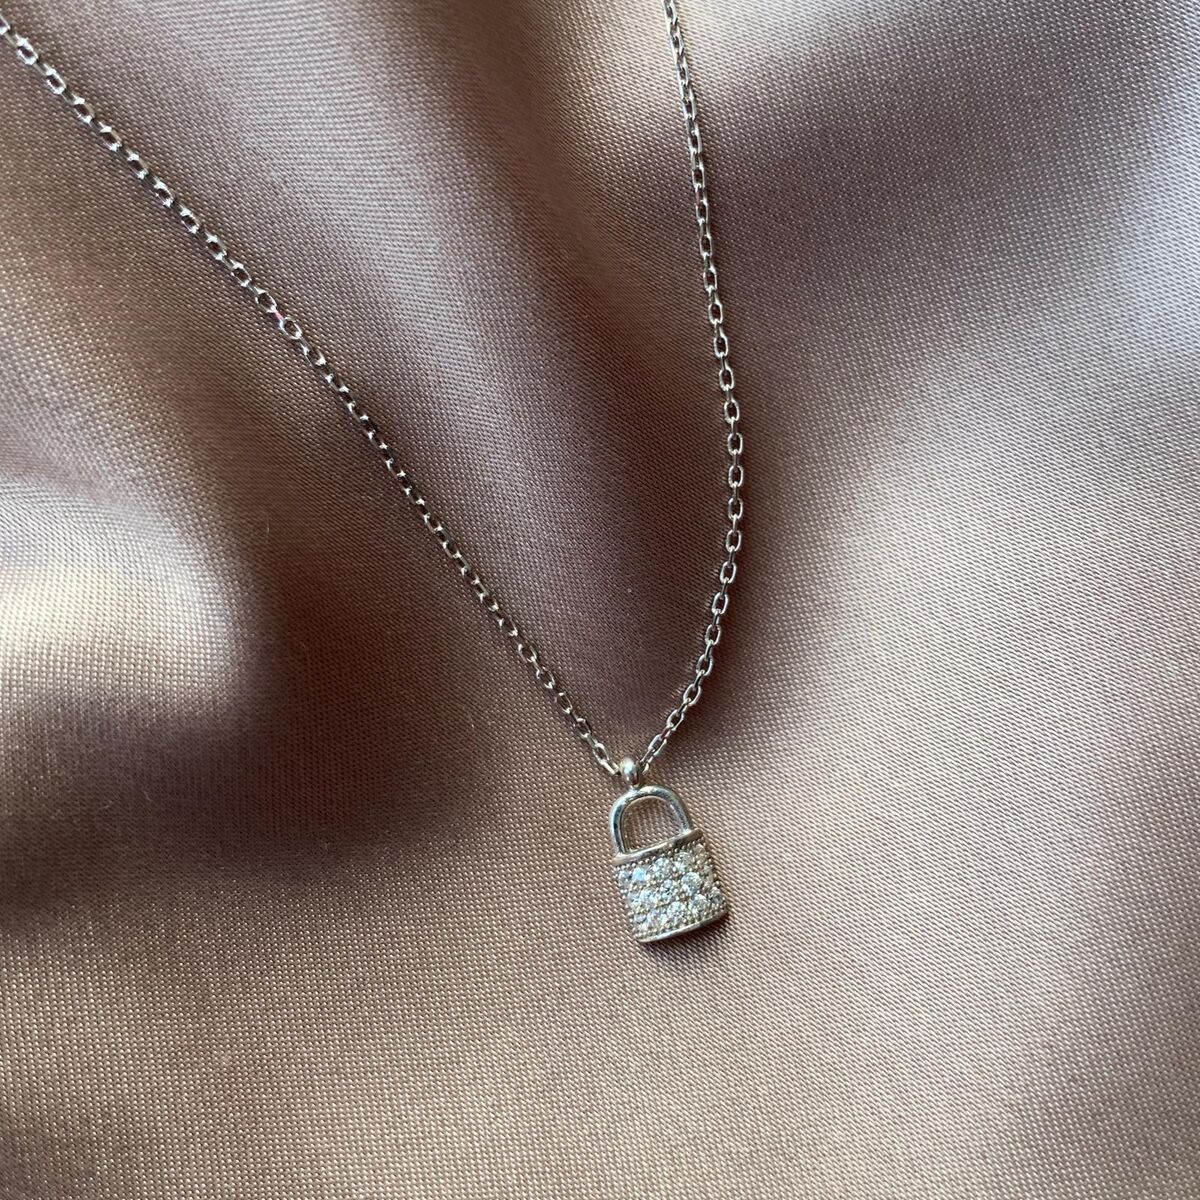 Taşlı Kilit Kolye   925 Gümüş